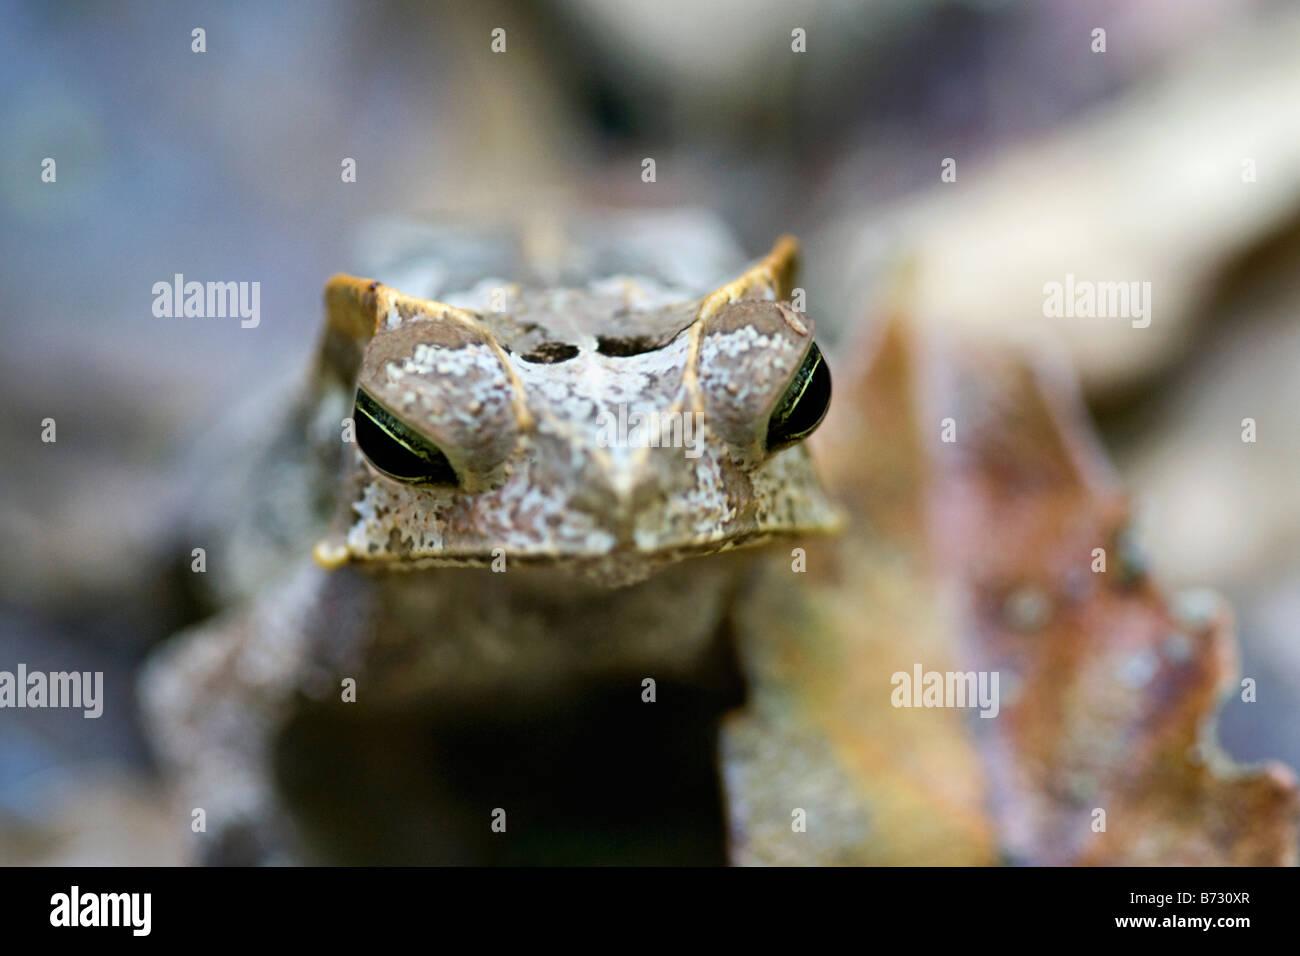 Suriname, Brownsweg, Brownsberg National Park. Horned toad. - Stock Image